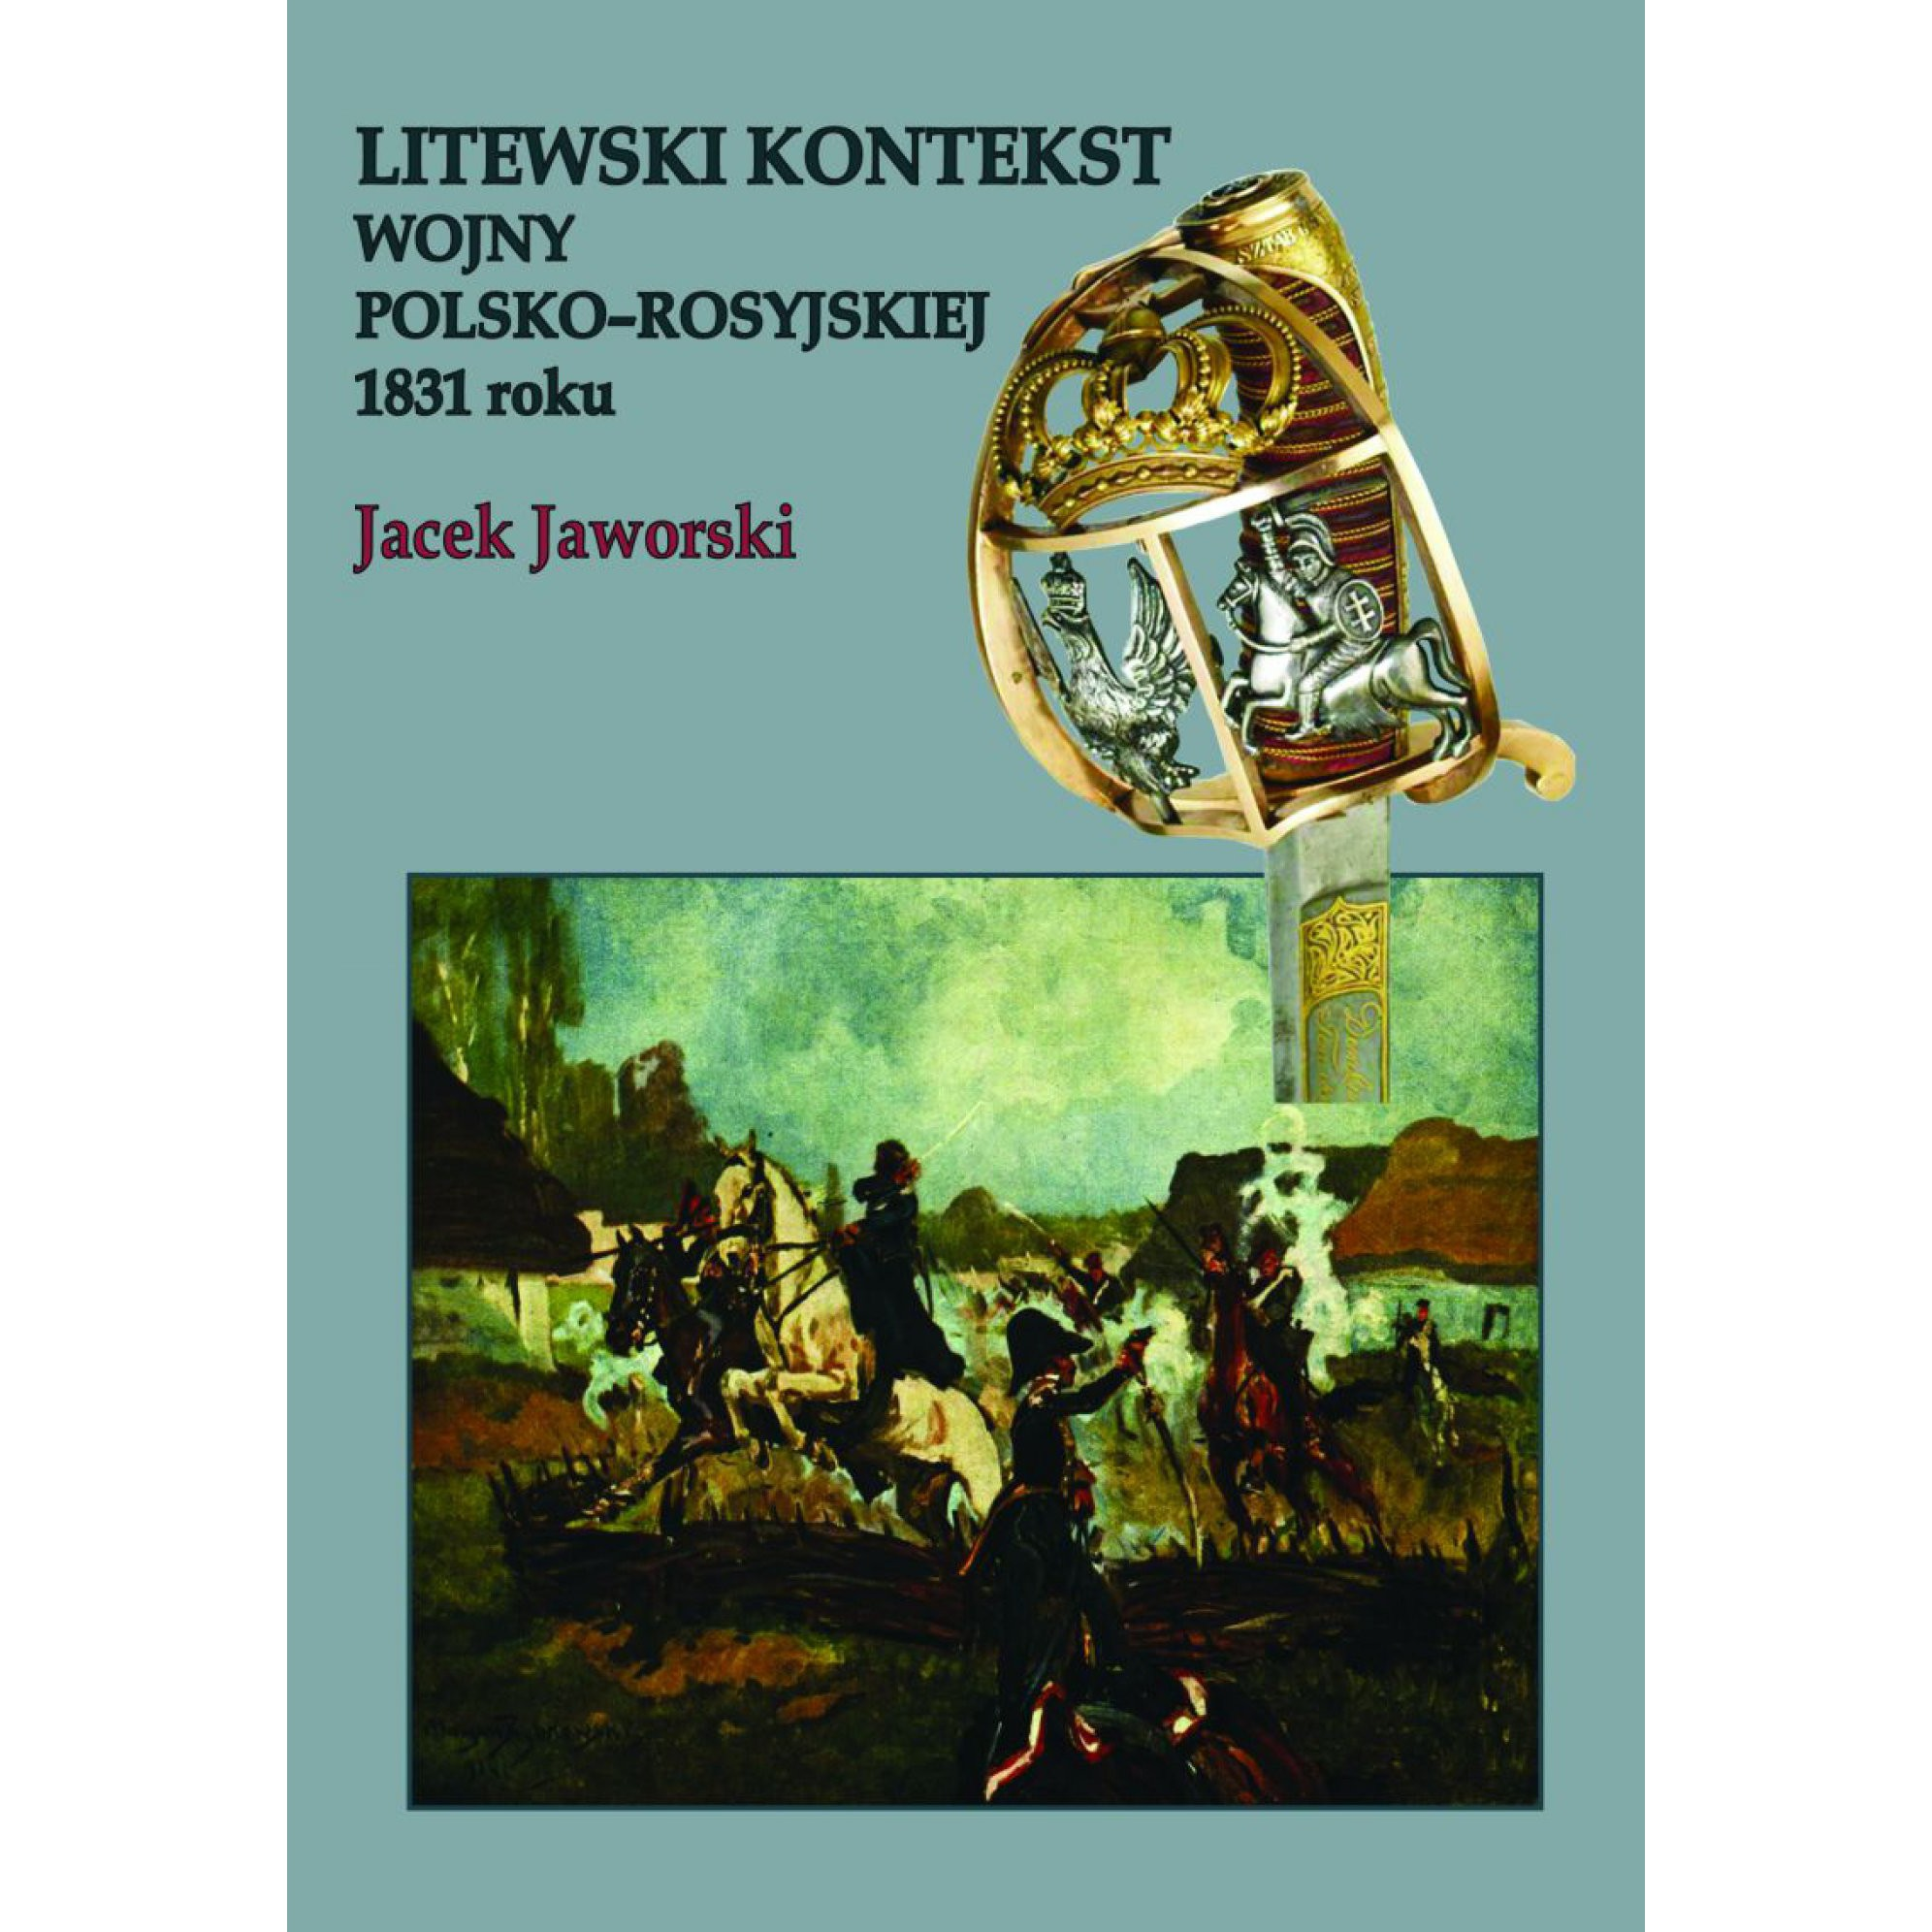 Litewski kontekst wojny polsko-rosyjskiej 1831 roku - Outlet